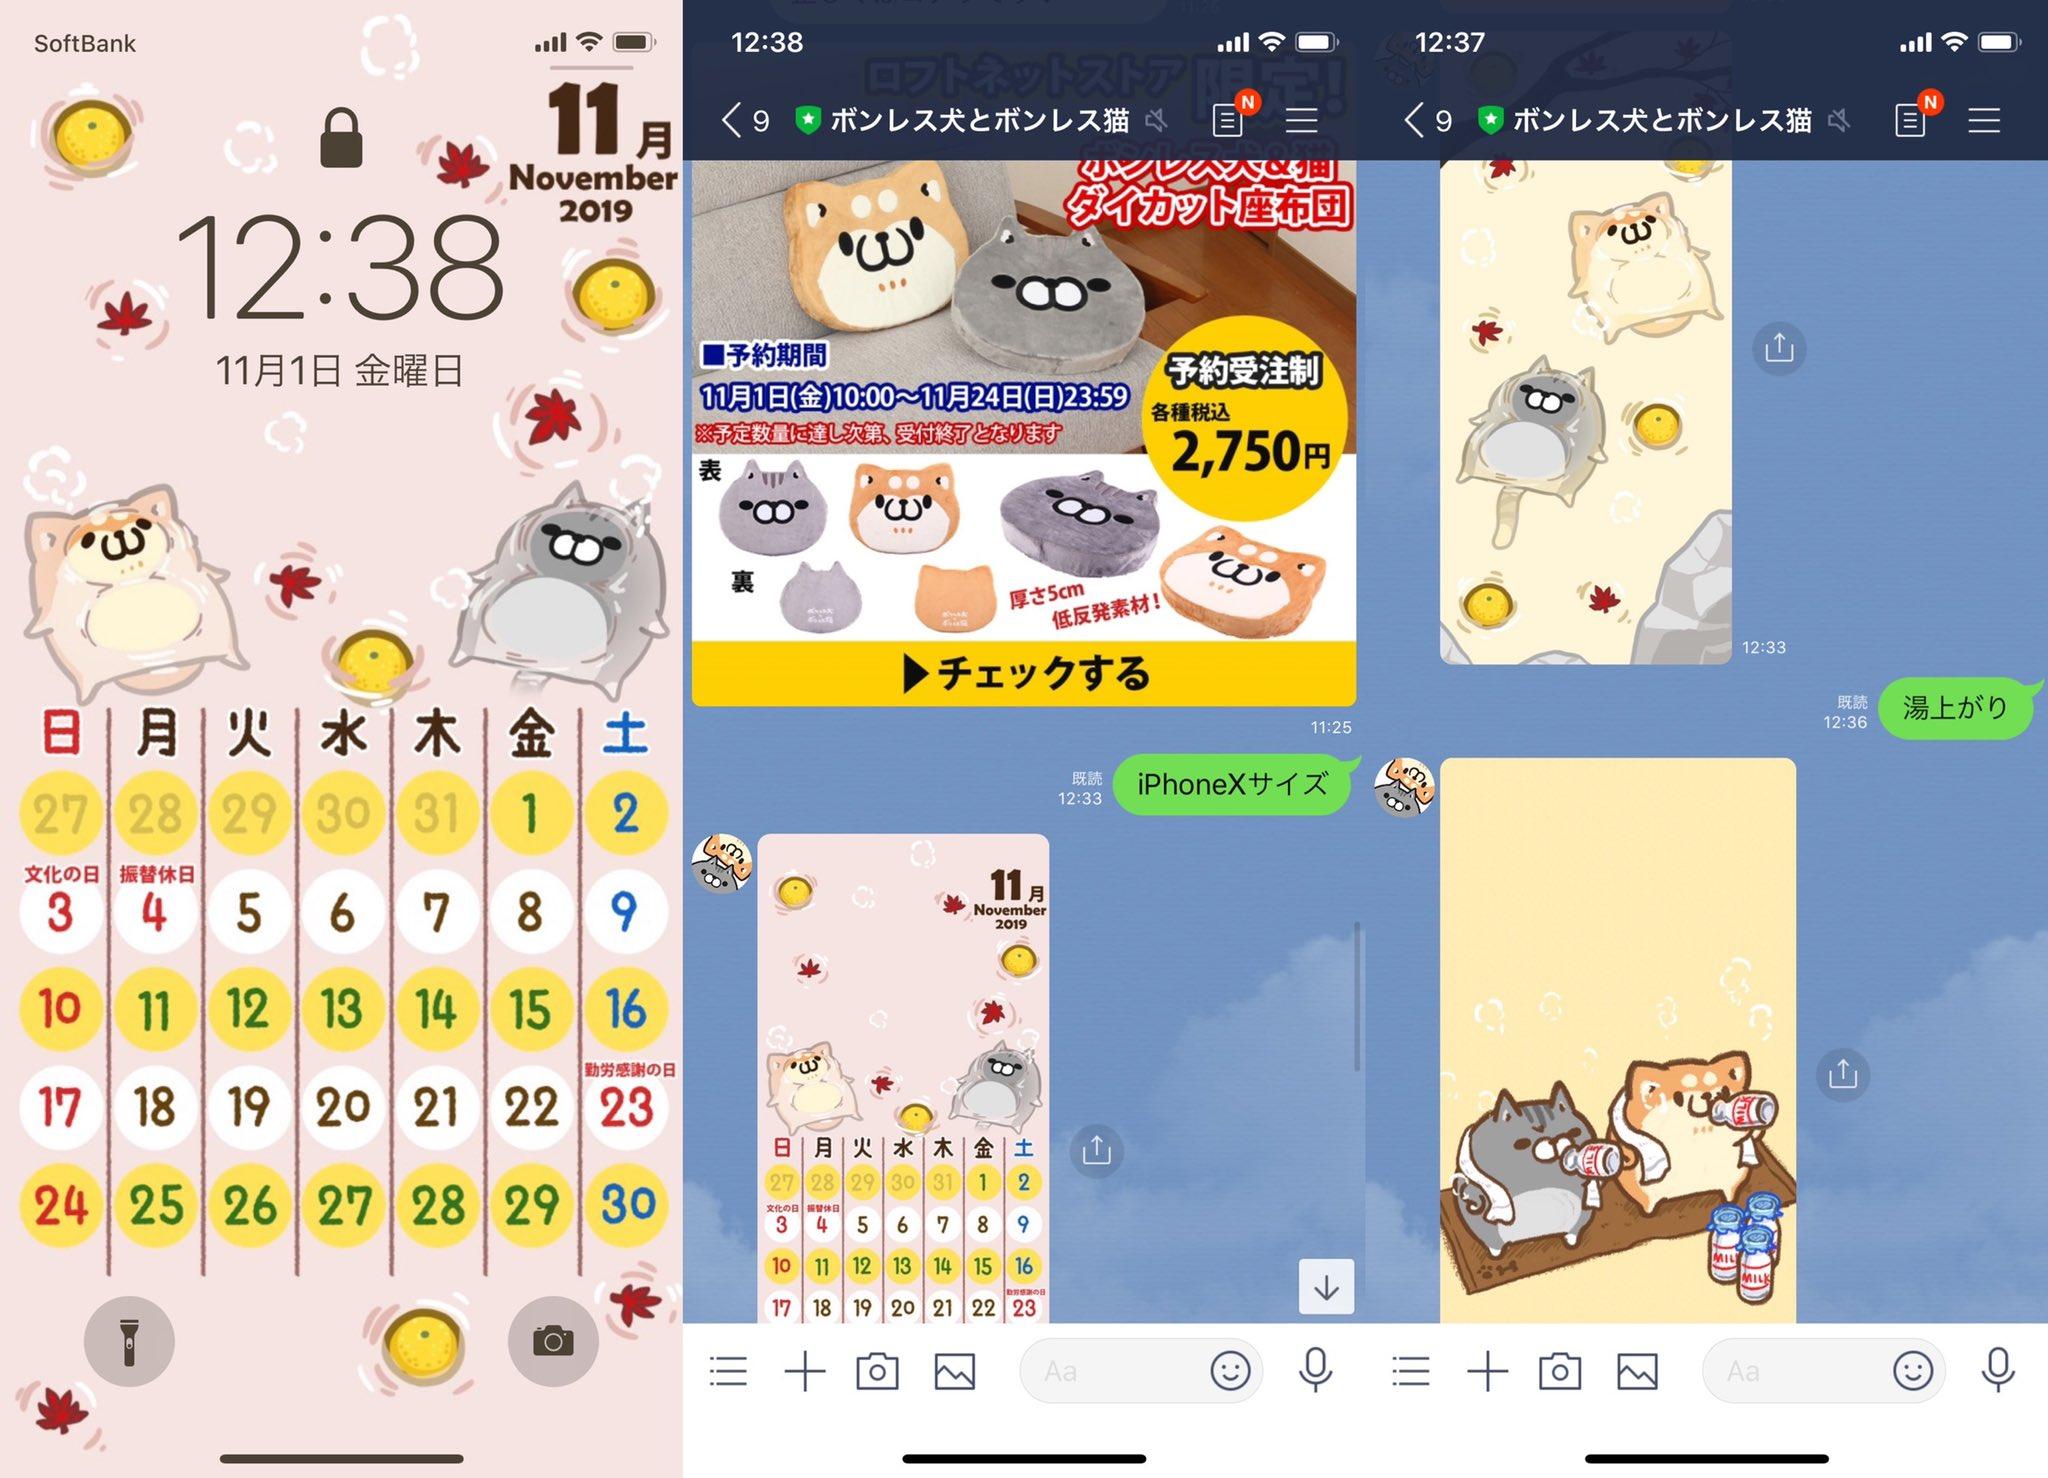 iPhone 11 Pro の壁紙にボンレス犬猫のカレンダー🐶🐱🍖 https://t.co/e45N9PrKpq